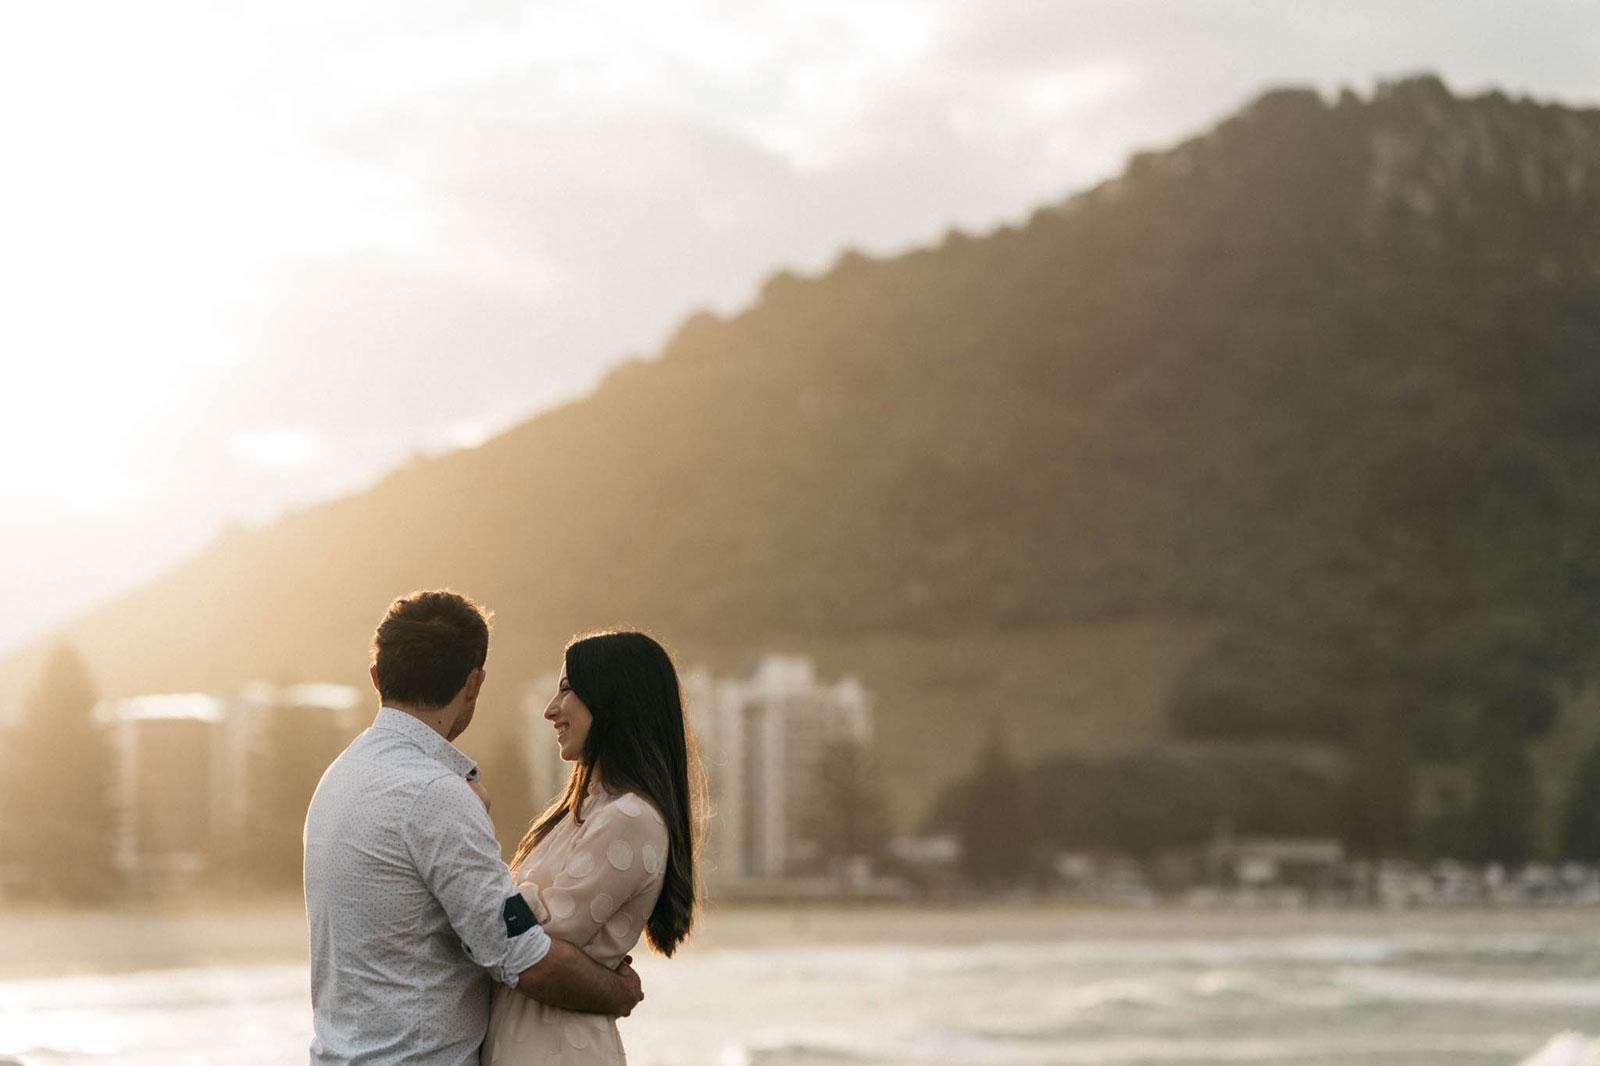 newfound-e-m-mt-maunganui-tauranga-wedding-photographer-021-a